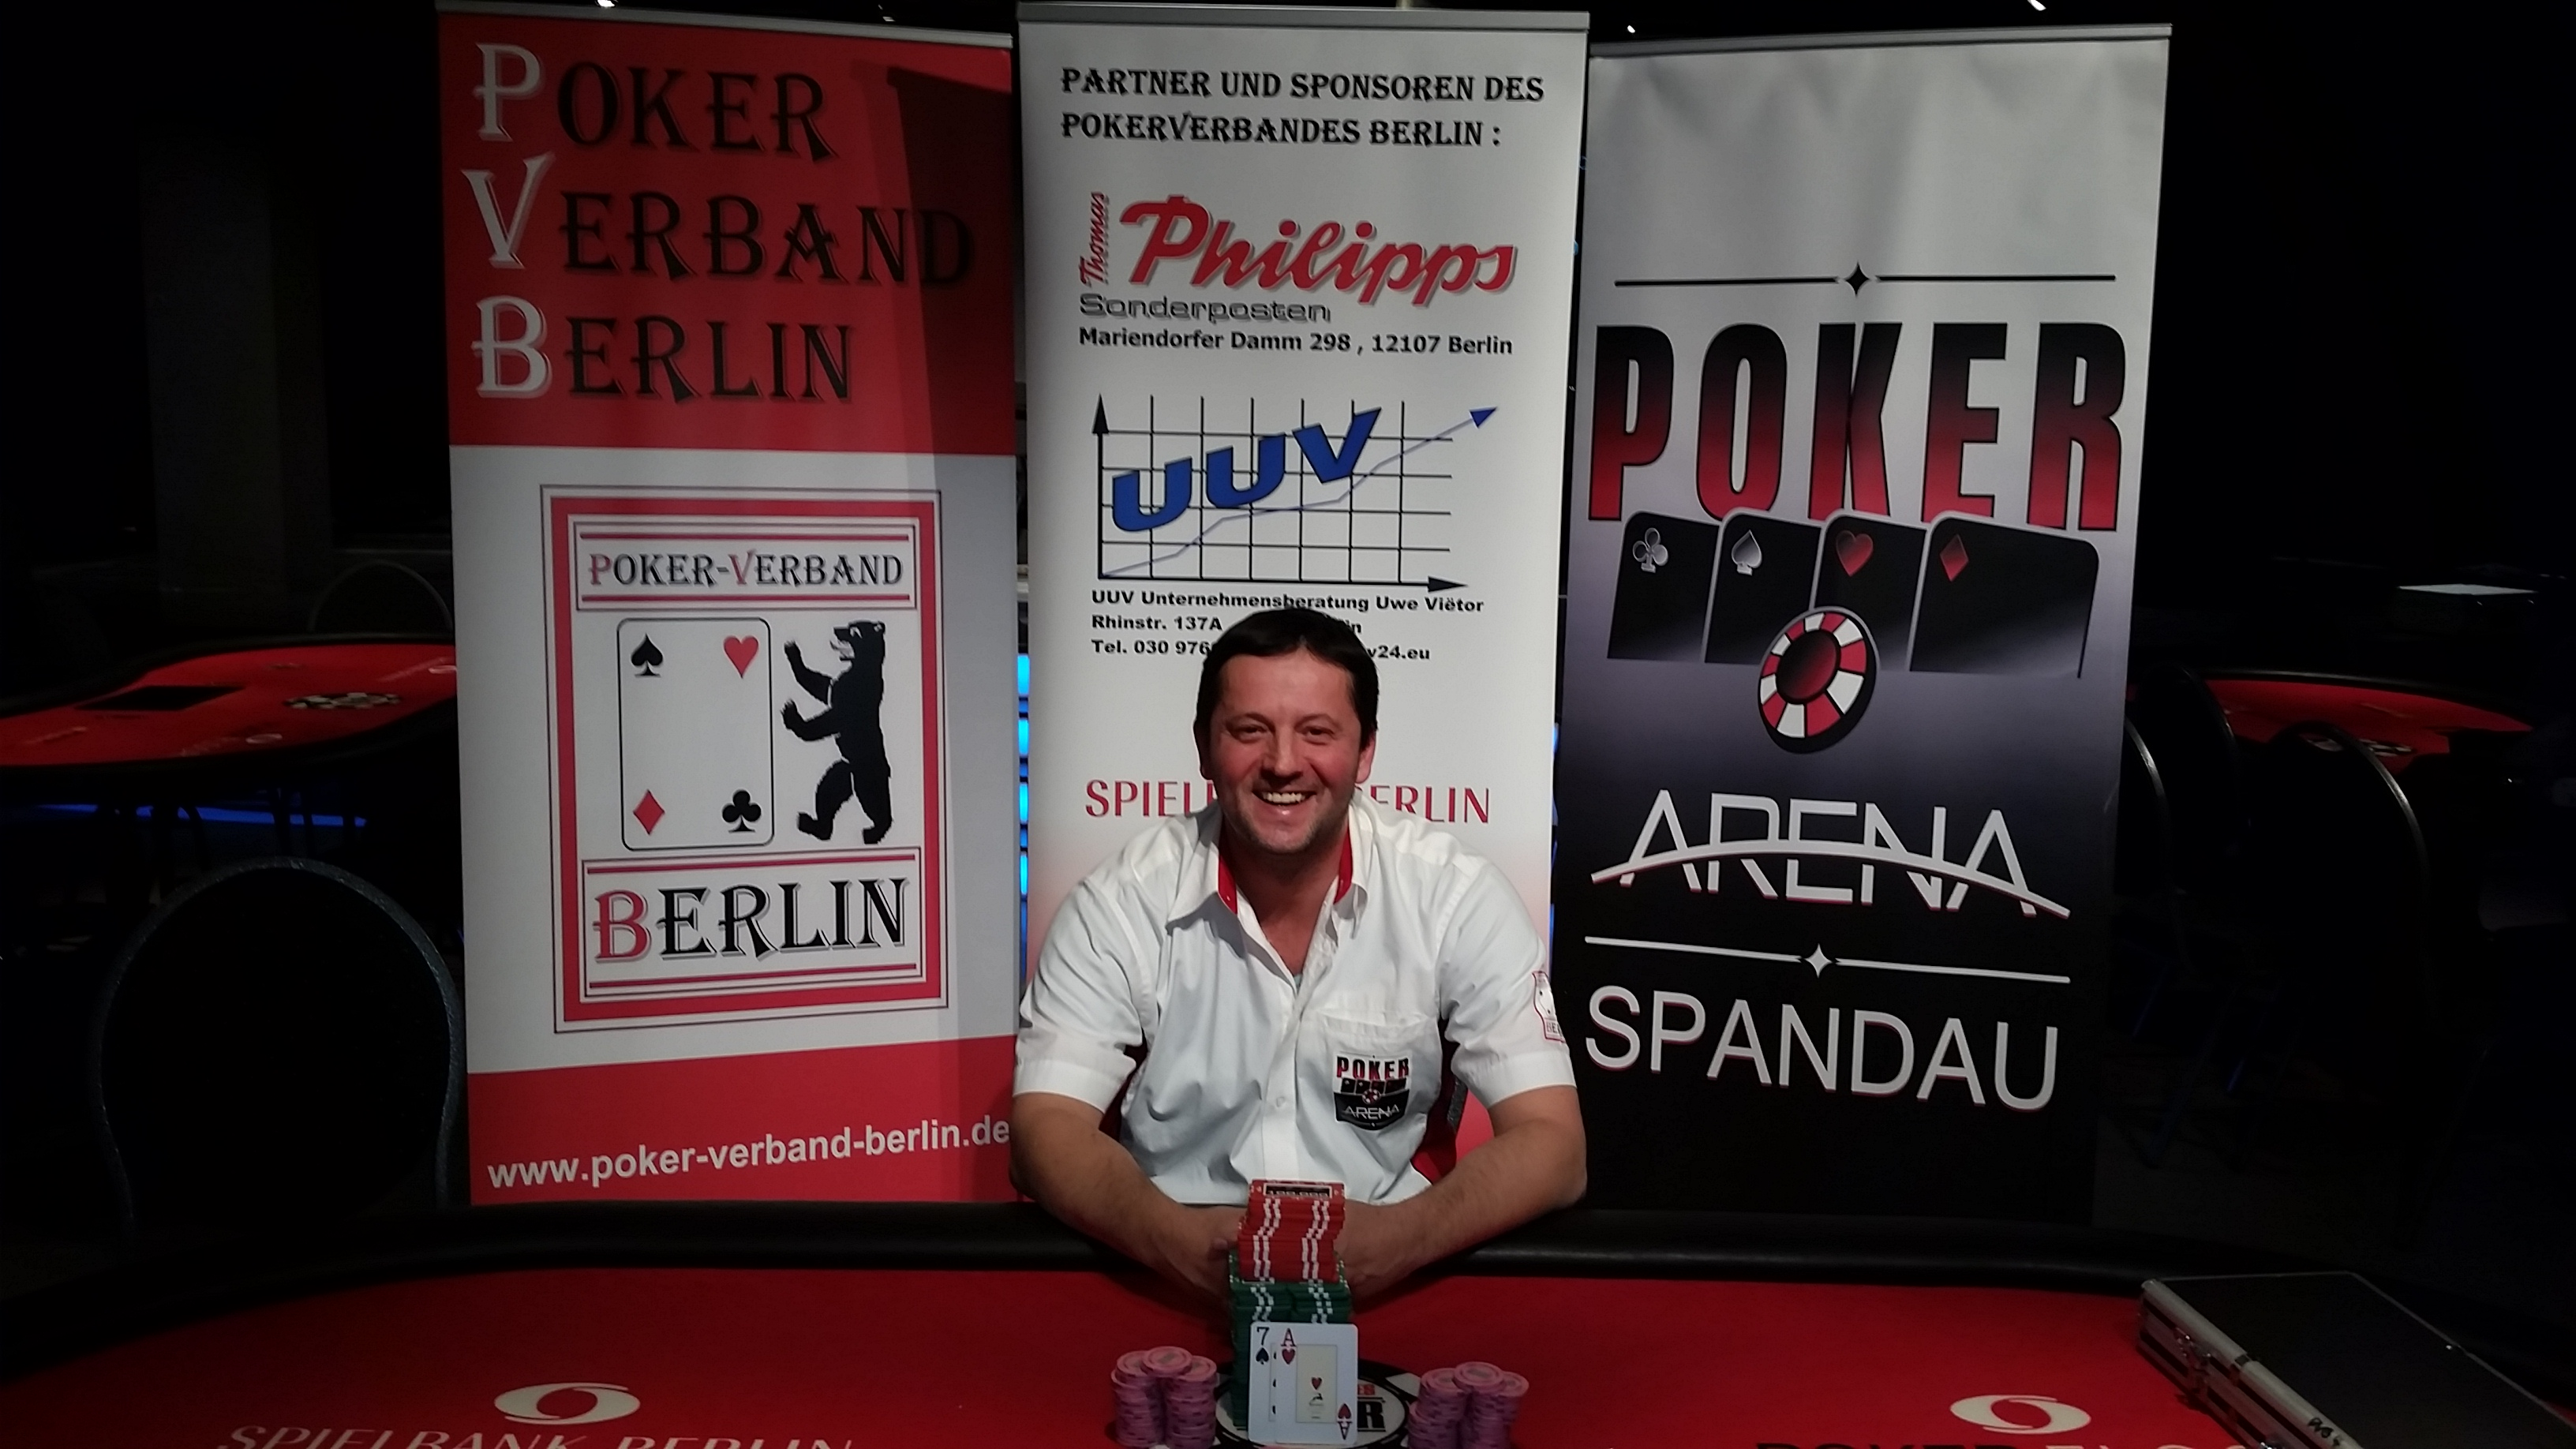 Berliner Pokermeister 2016 des PVB : Rade Vitomir von der PokerArena Spandau e.V.